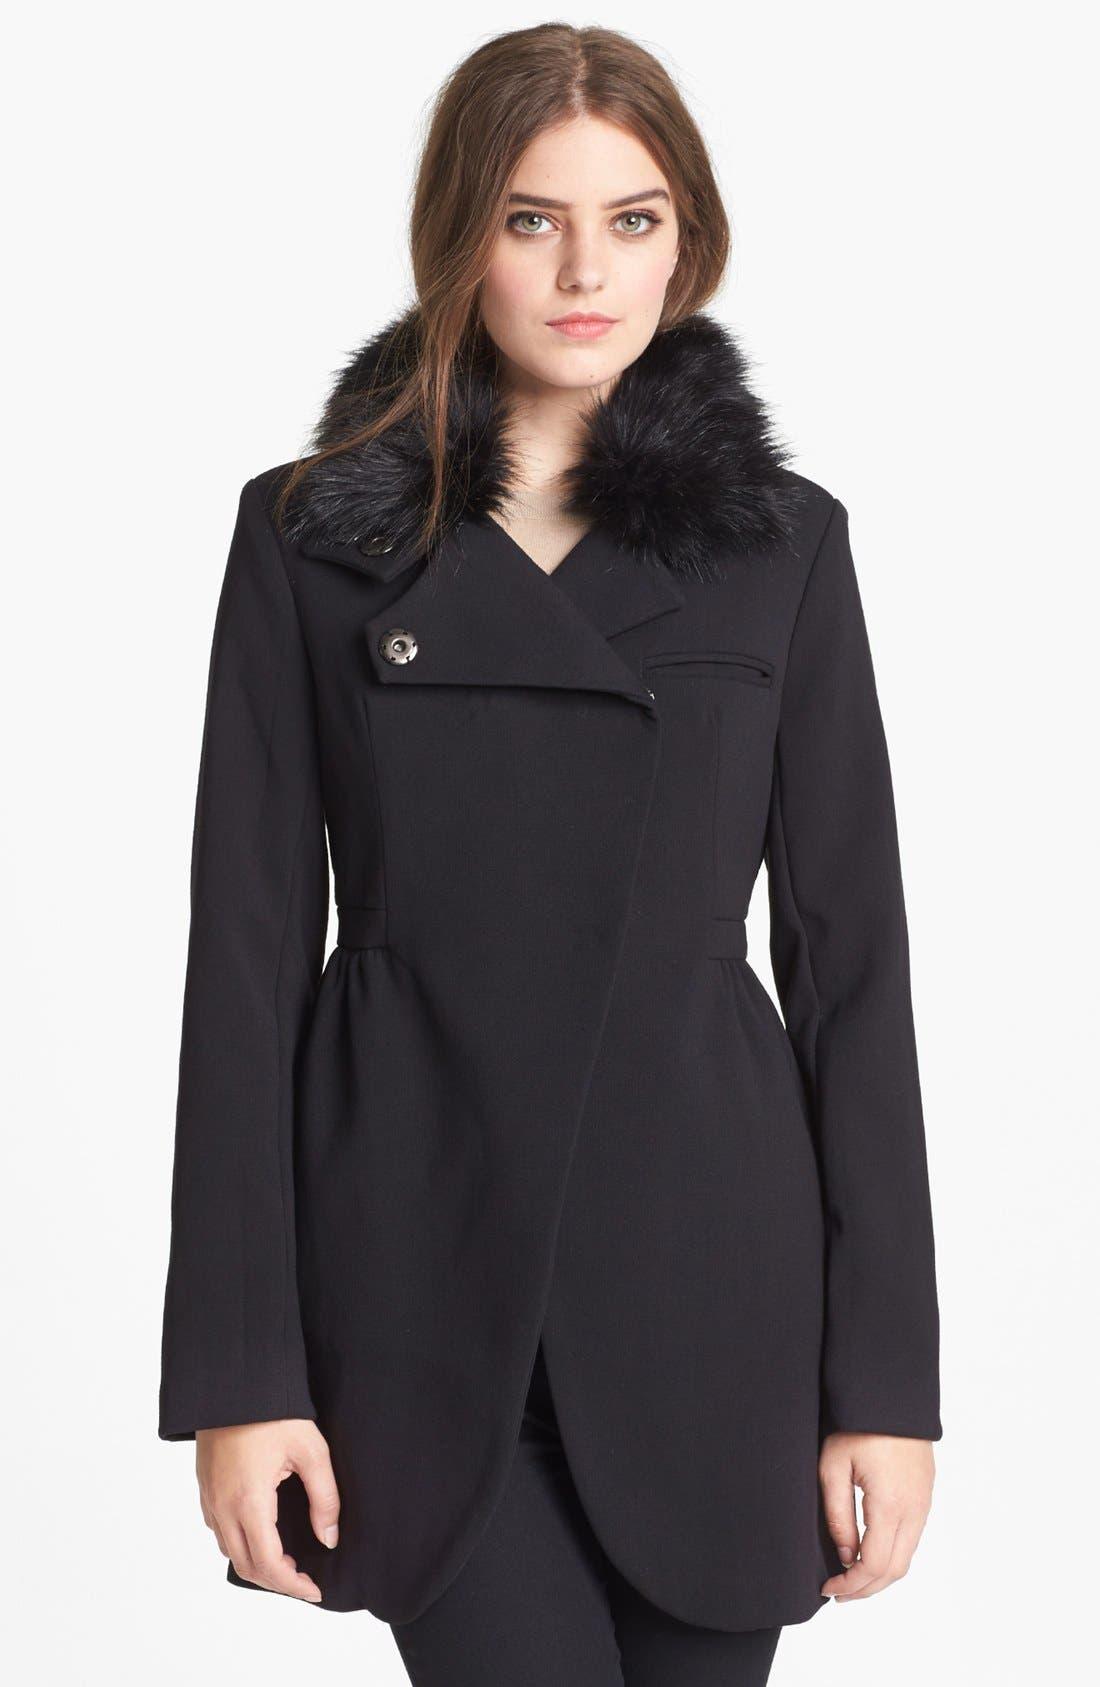 Alternate Image 1 Selected - bebe Asymmetrical Coat with Detachable Faux Fur Collar